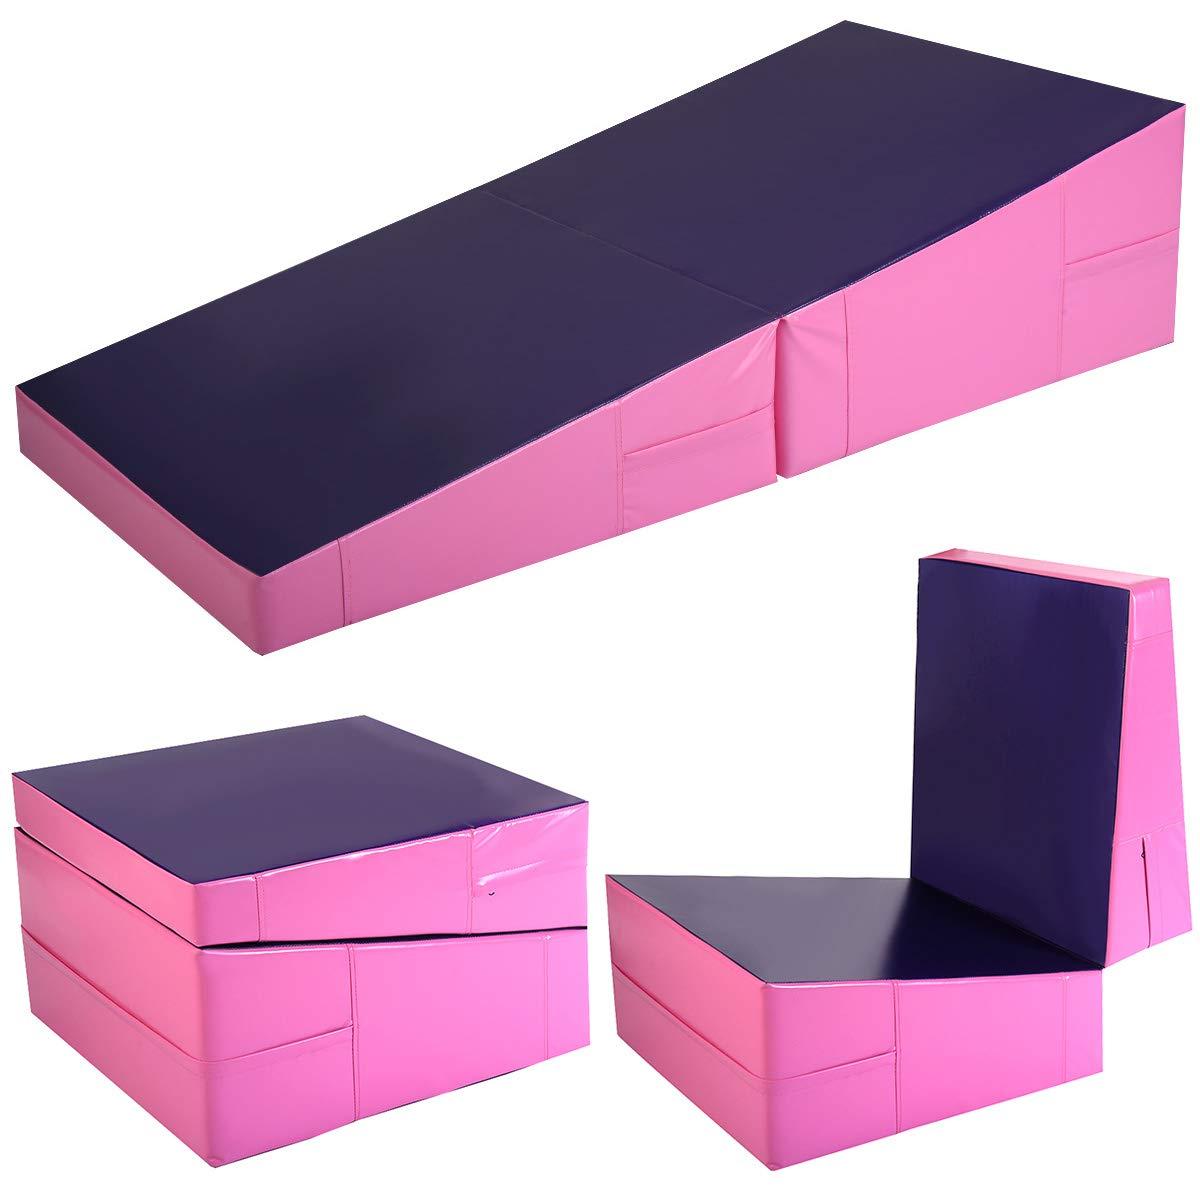 Giantex Incline Gymnastics Mat Wedge Folding and Non-Folding Gymnastics Gym Fitness Skill Shape Tumbling Mat for Kids Play Home Exercise Aerobics 60'' X 30'' X 14''(Pink/Purple)